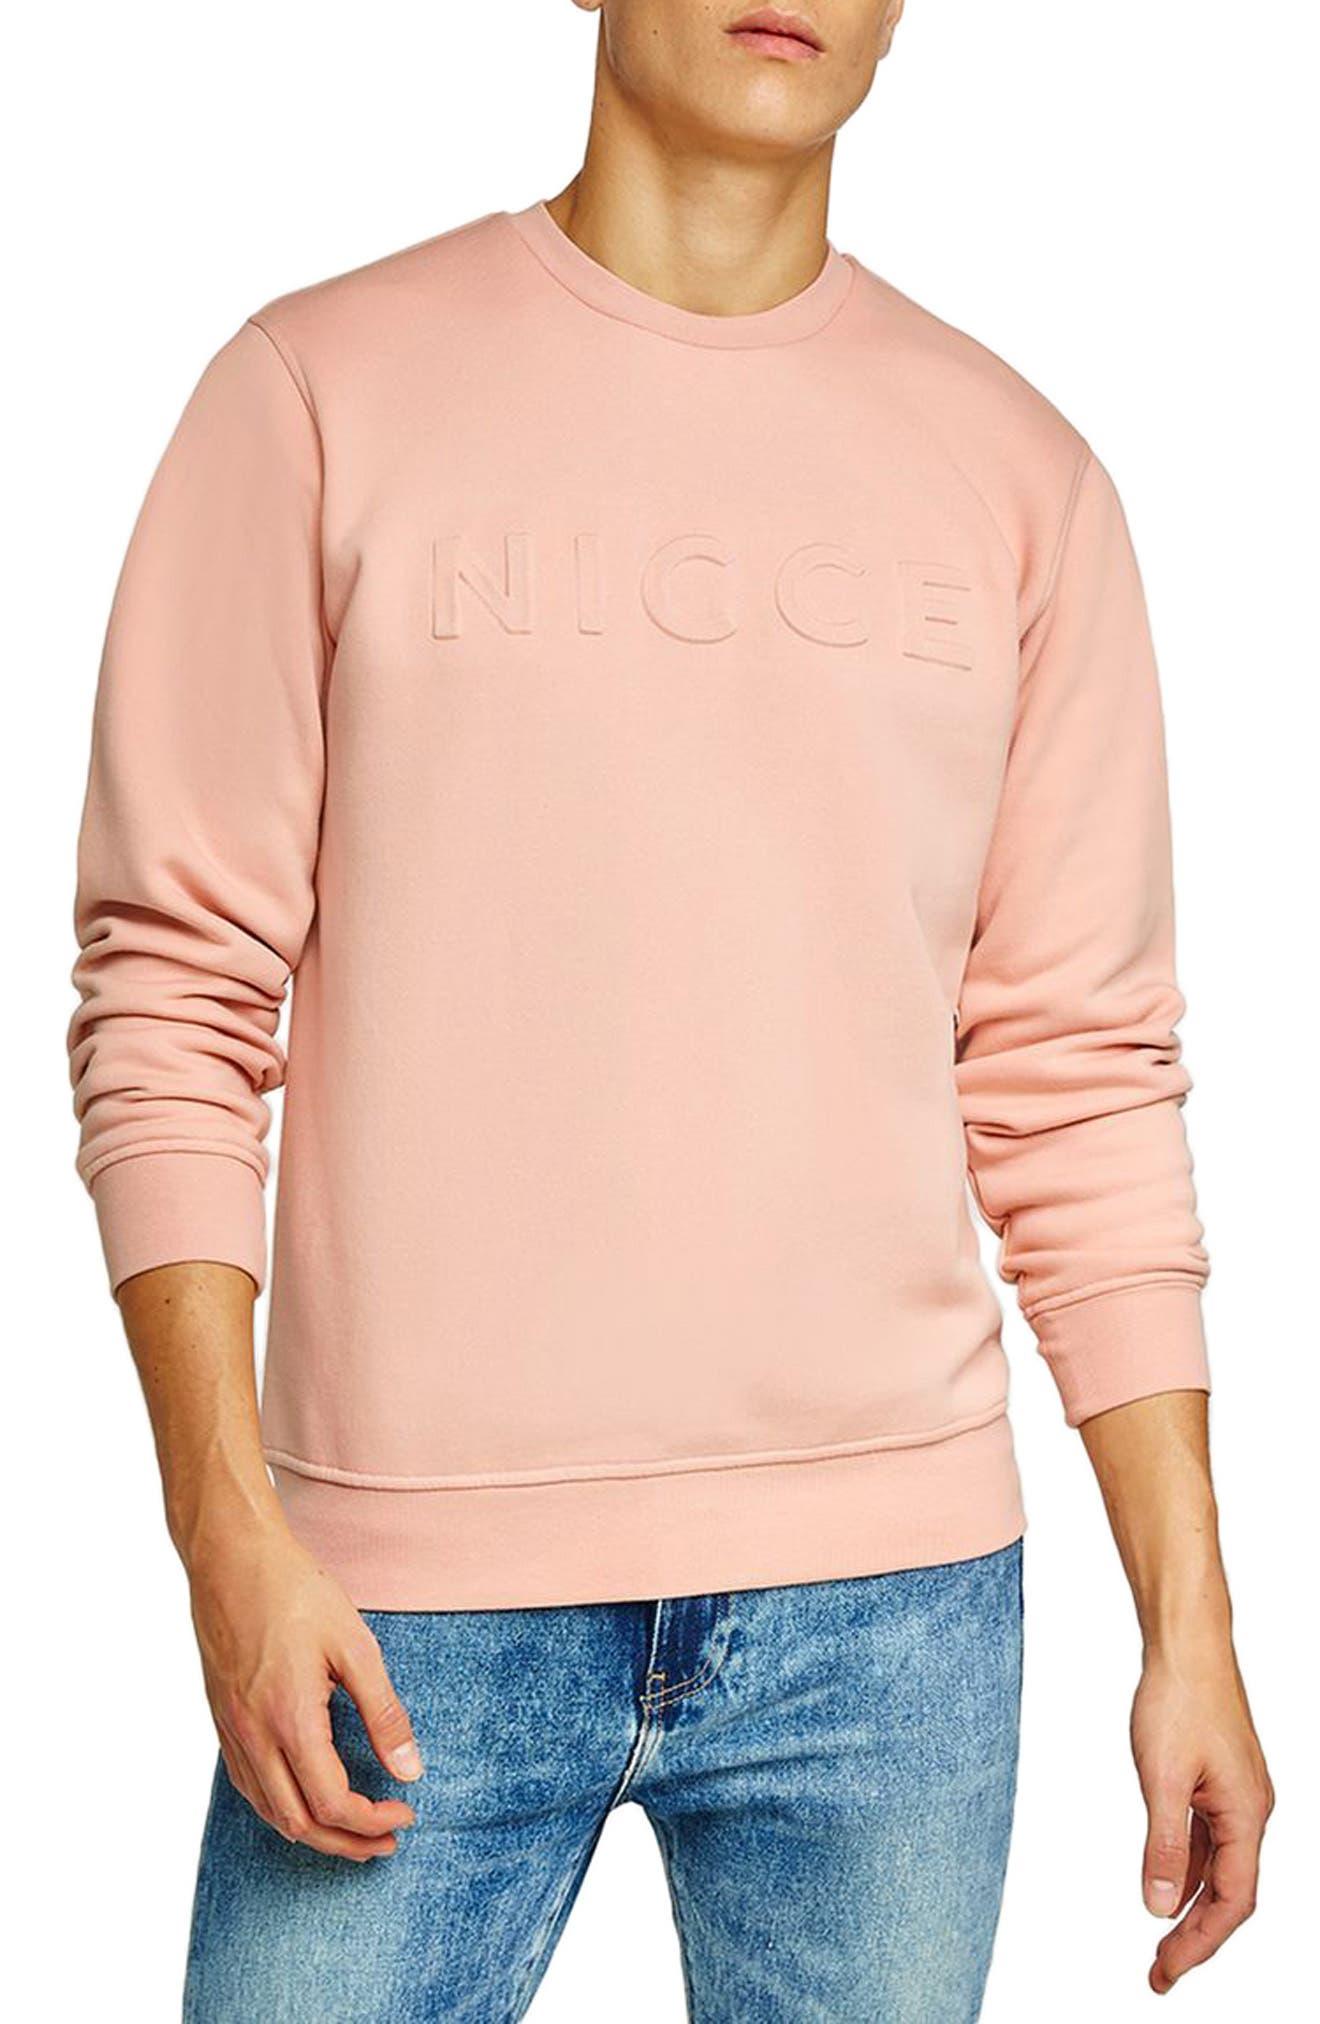 NICCE Slim Fit Embossed Sweatshirt,                             Main thumbnail 1, color,                             650